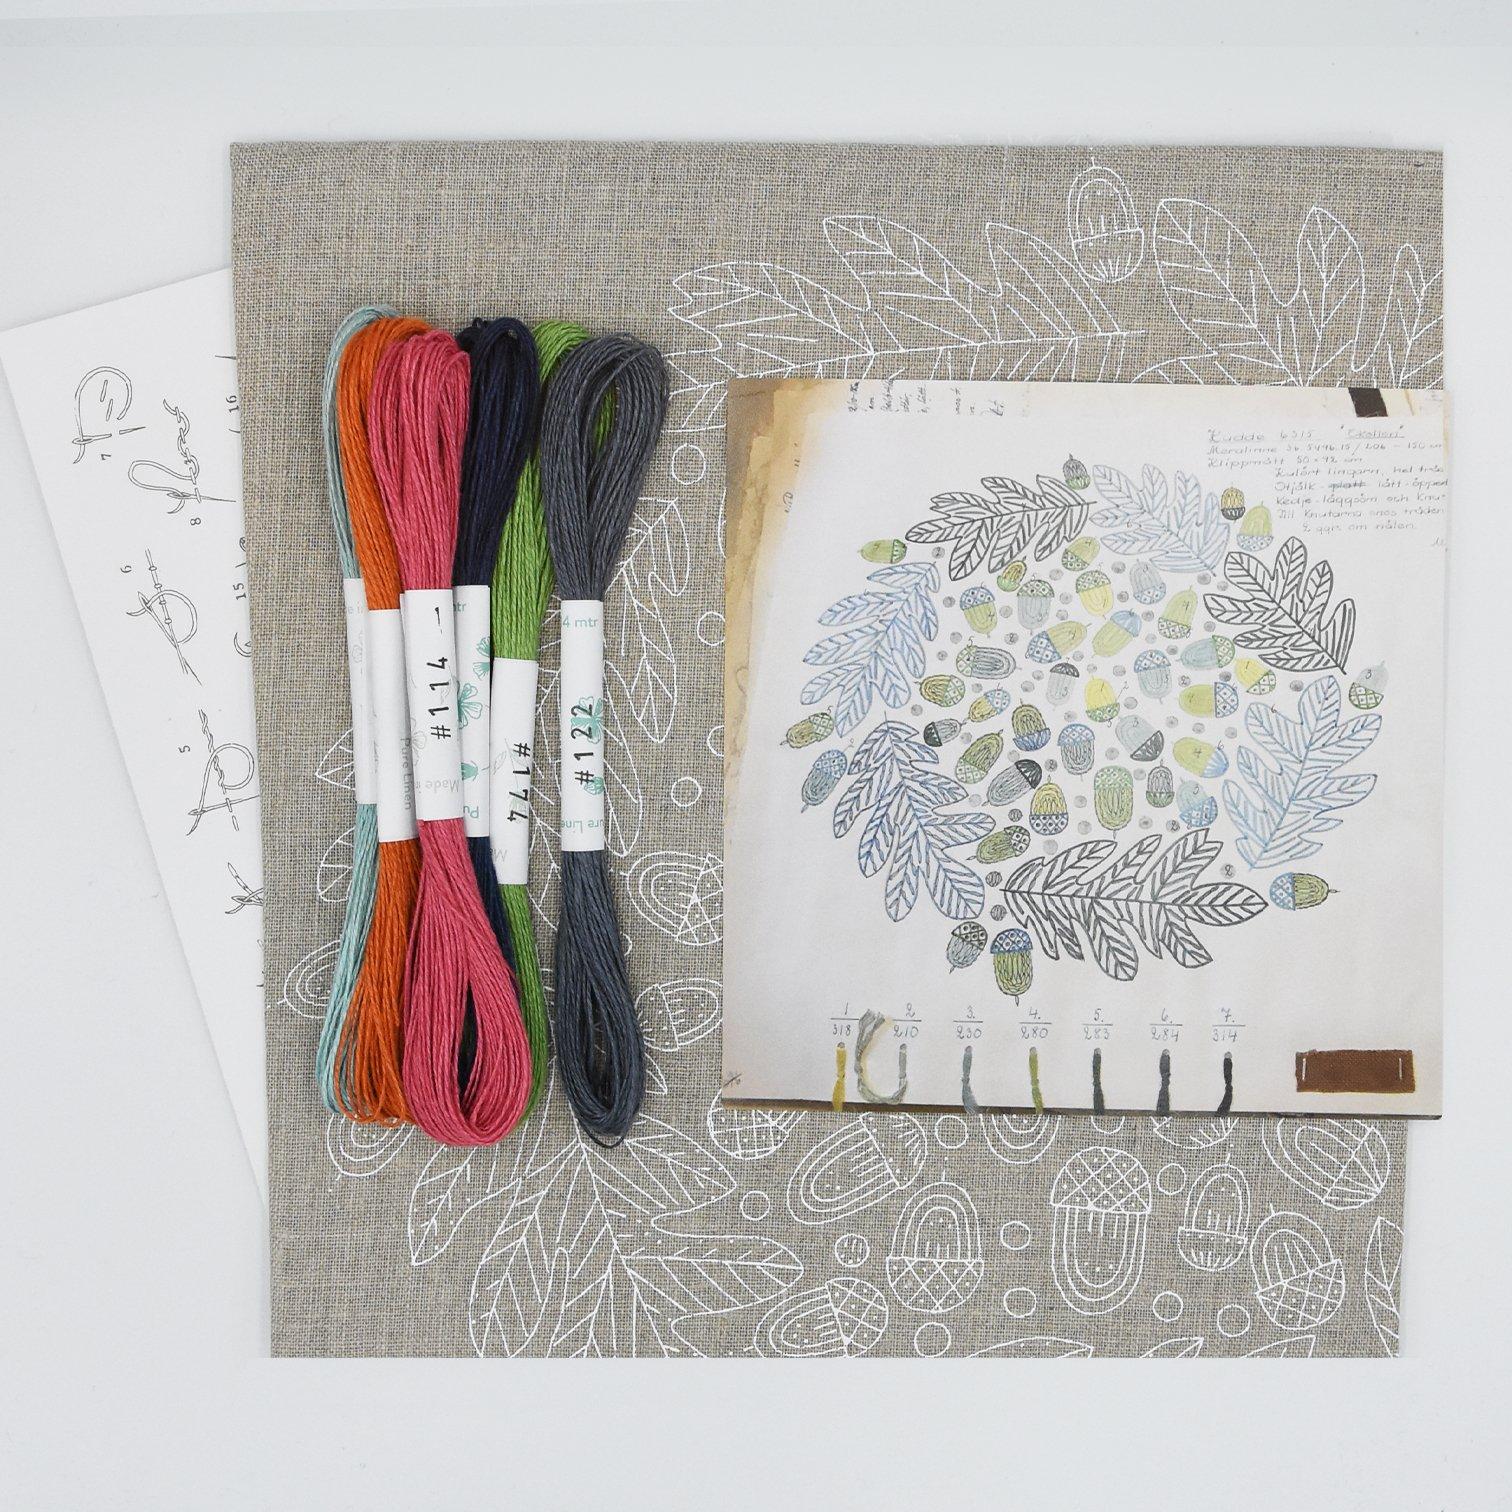 Linladan - Acorn - Swedish Embroidery Kit 27